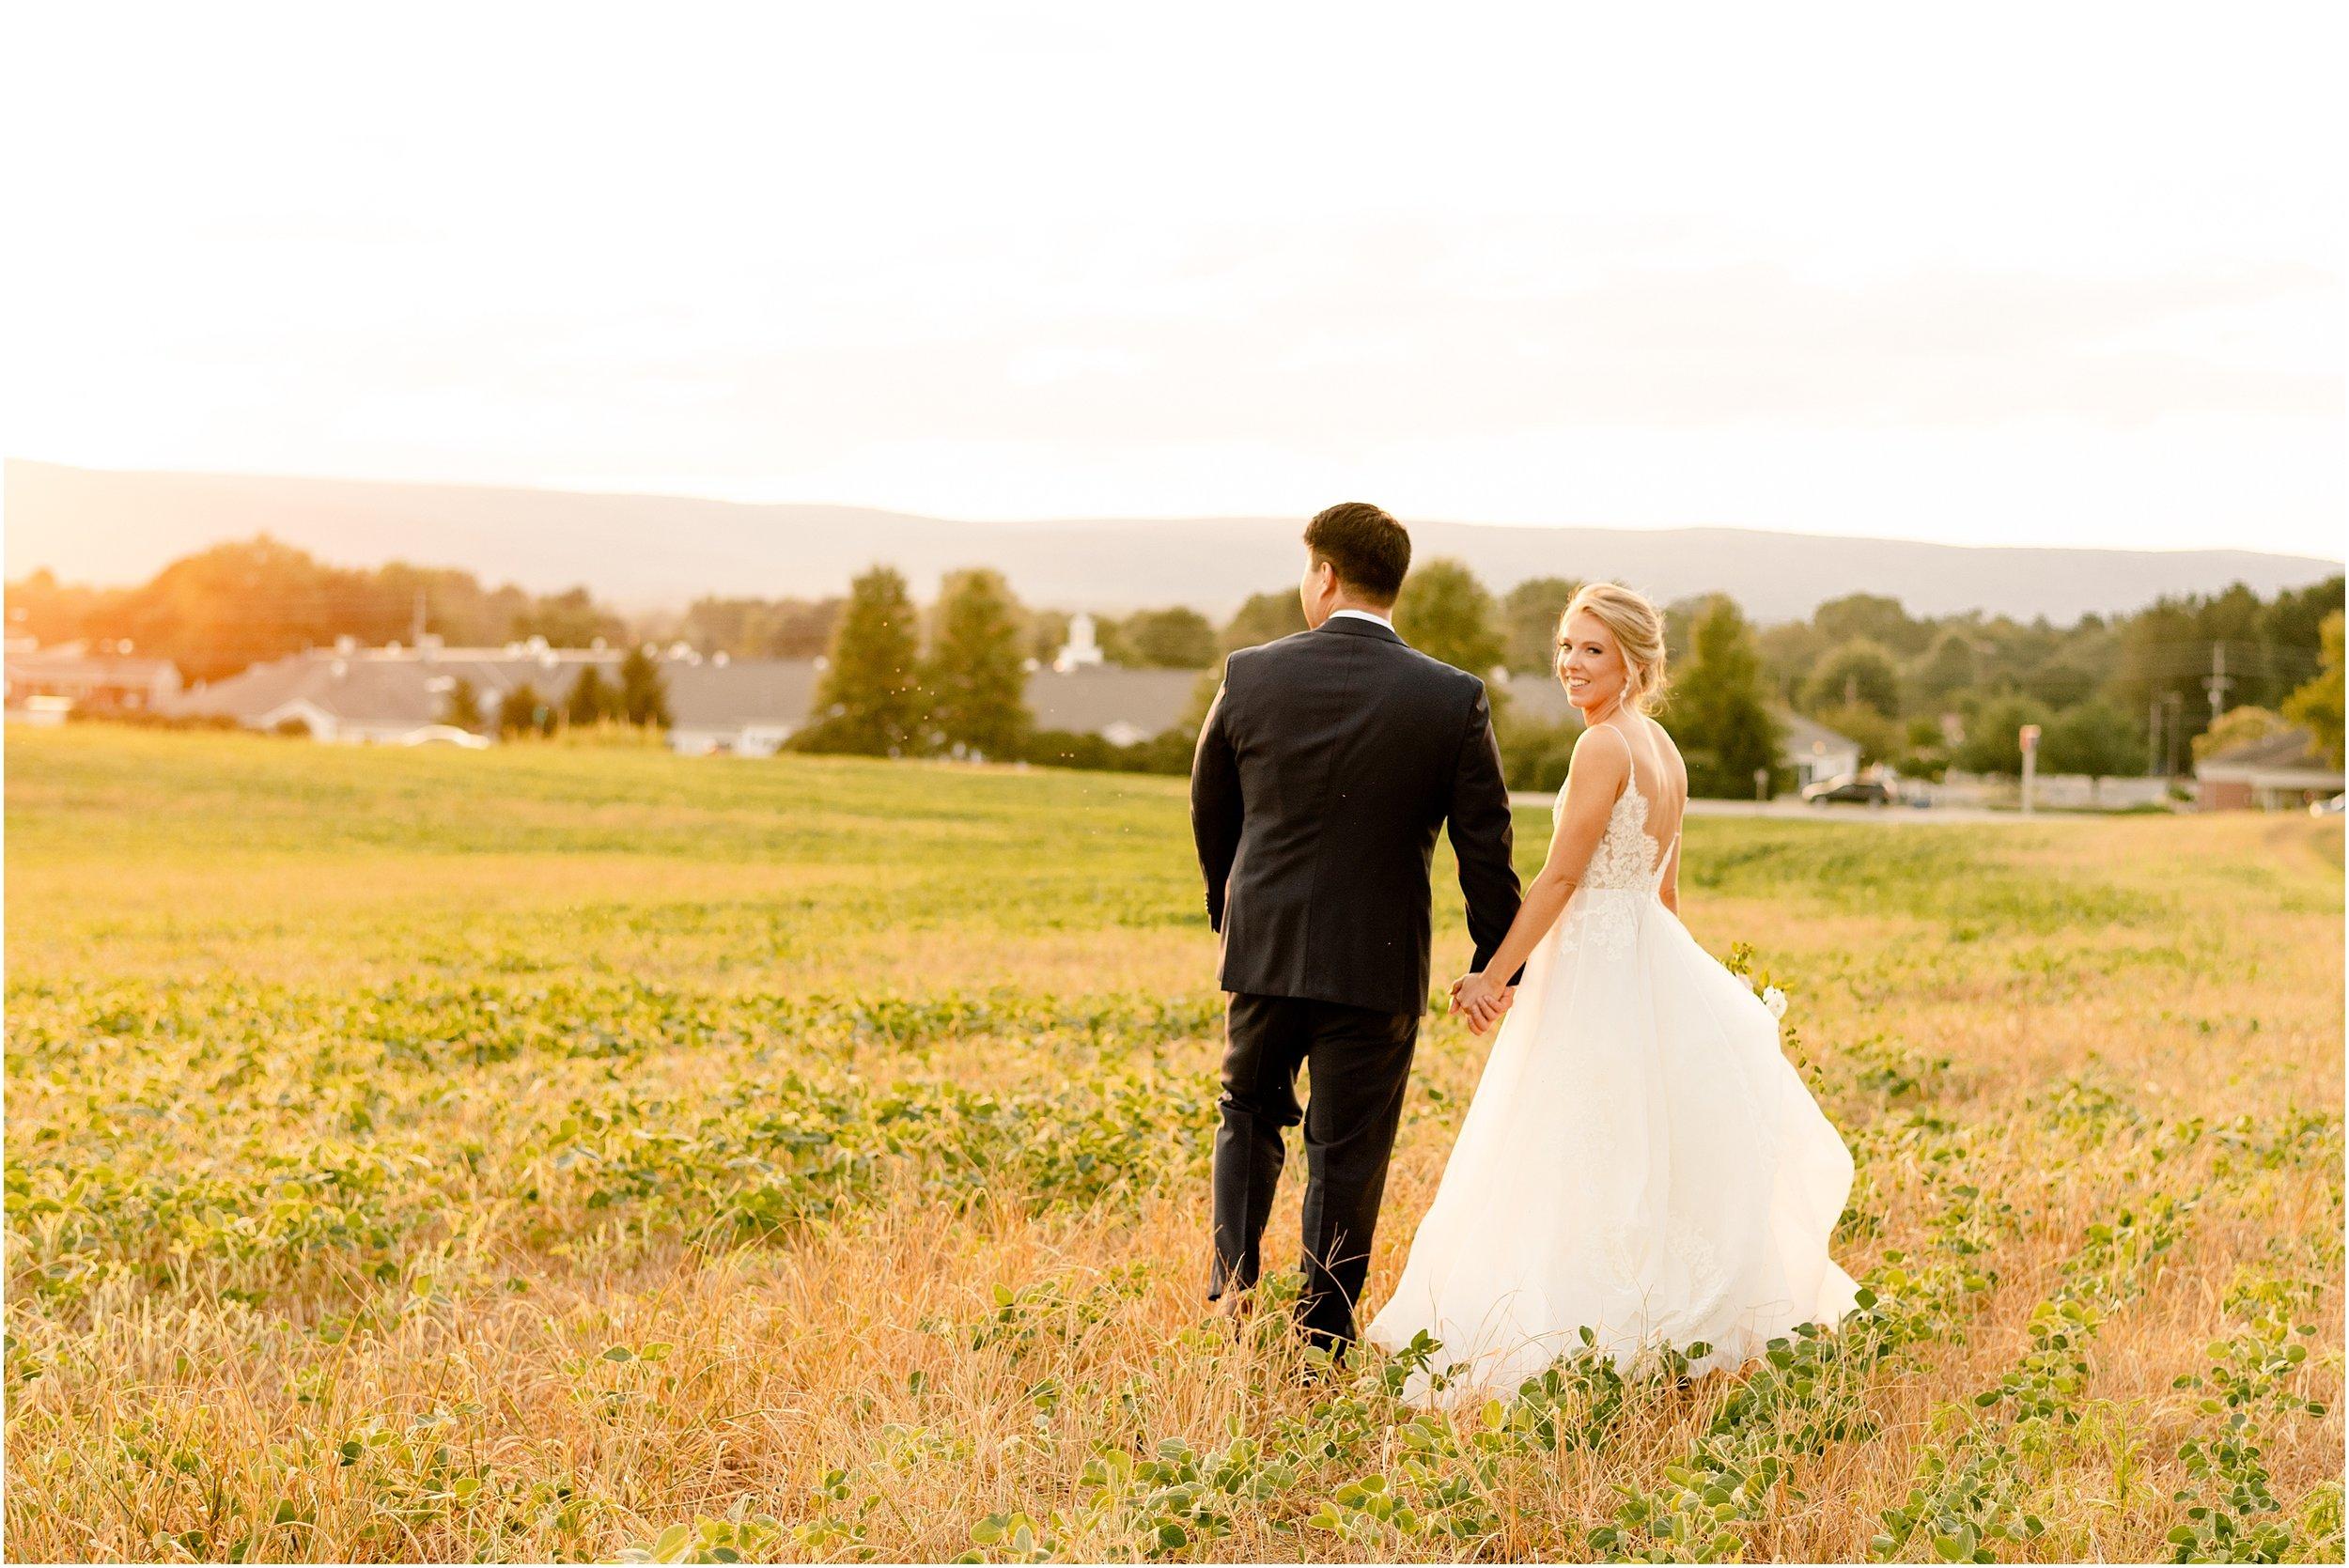 hannah leigh photography Walkers Overlook Wedding Walkersville MD_3558.jpg